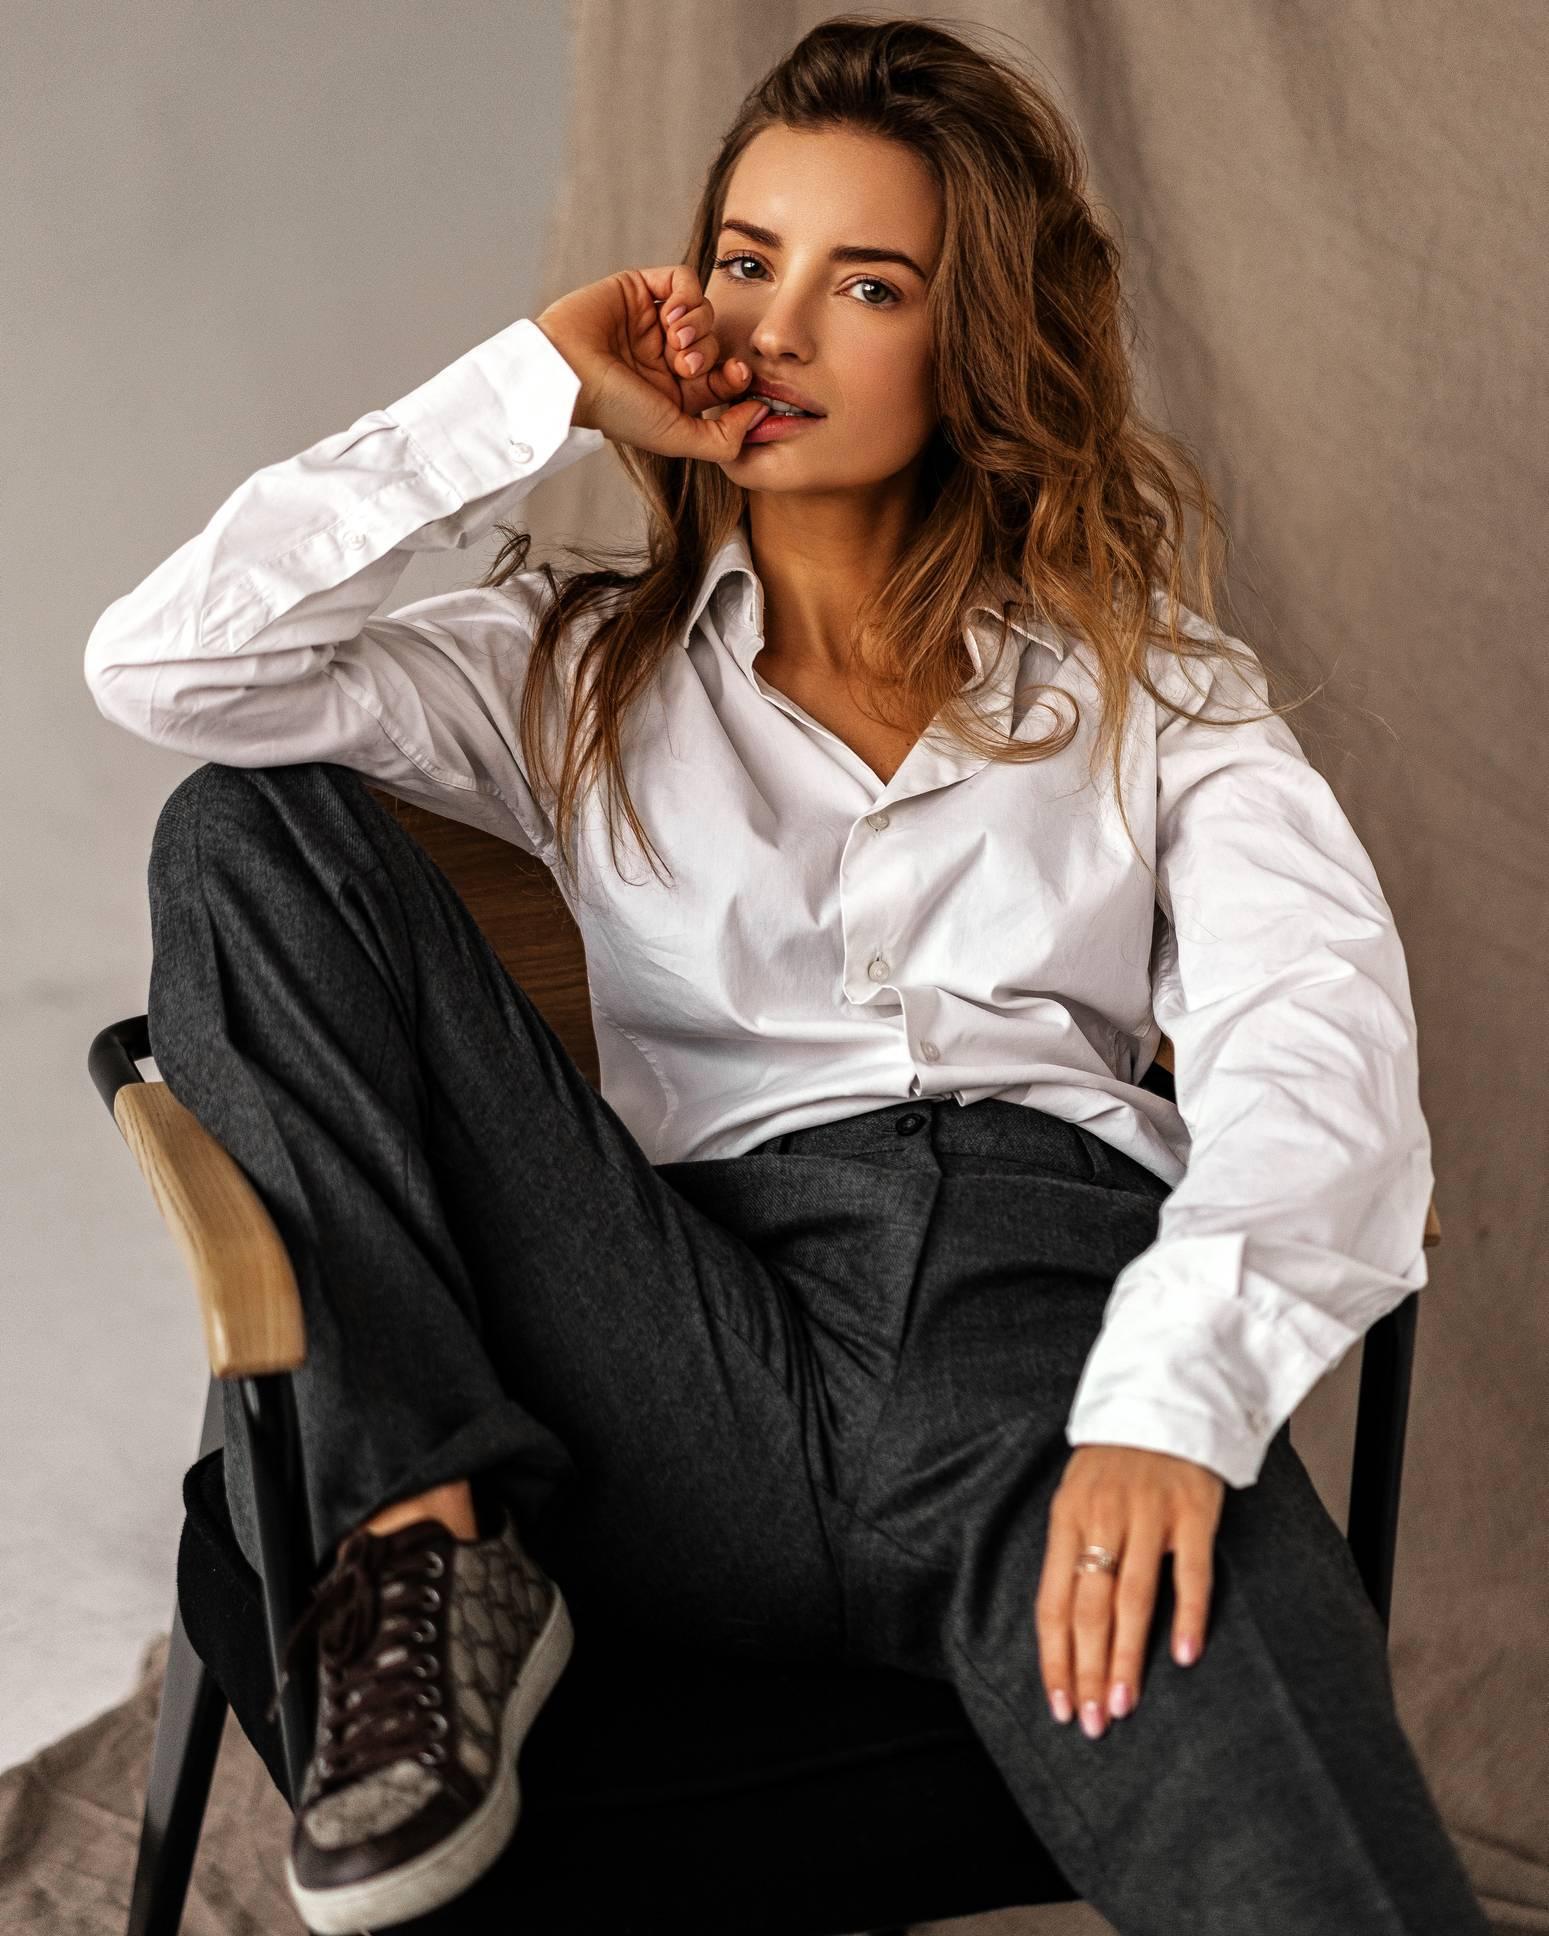 chemise femme look tendance